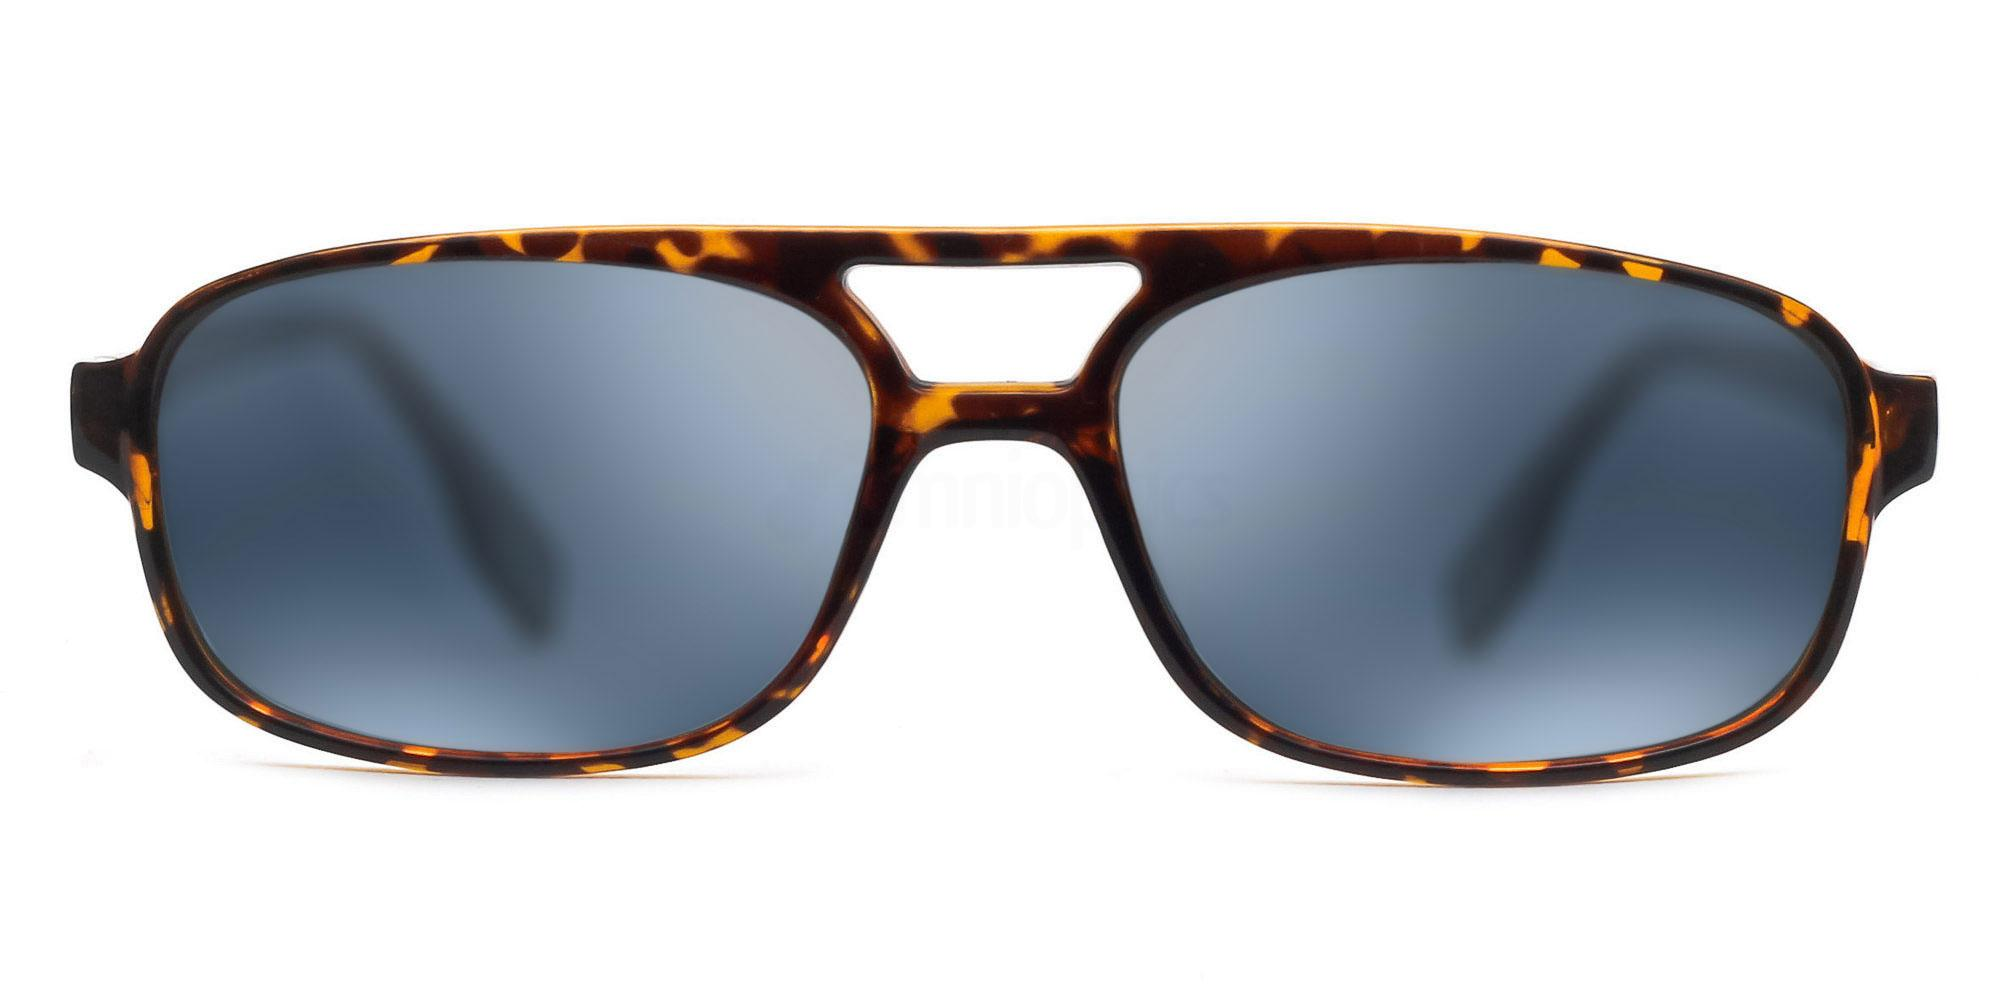 C04 Polarized Grey with Silver Mirror P2395 - Demi Havana (Mirrored Polarized) Sunglasses, Savannah